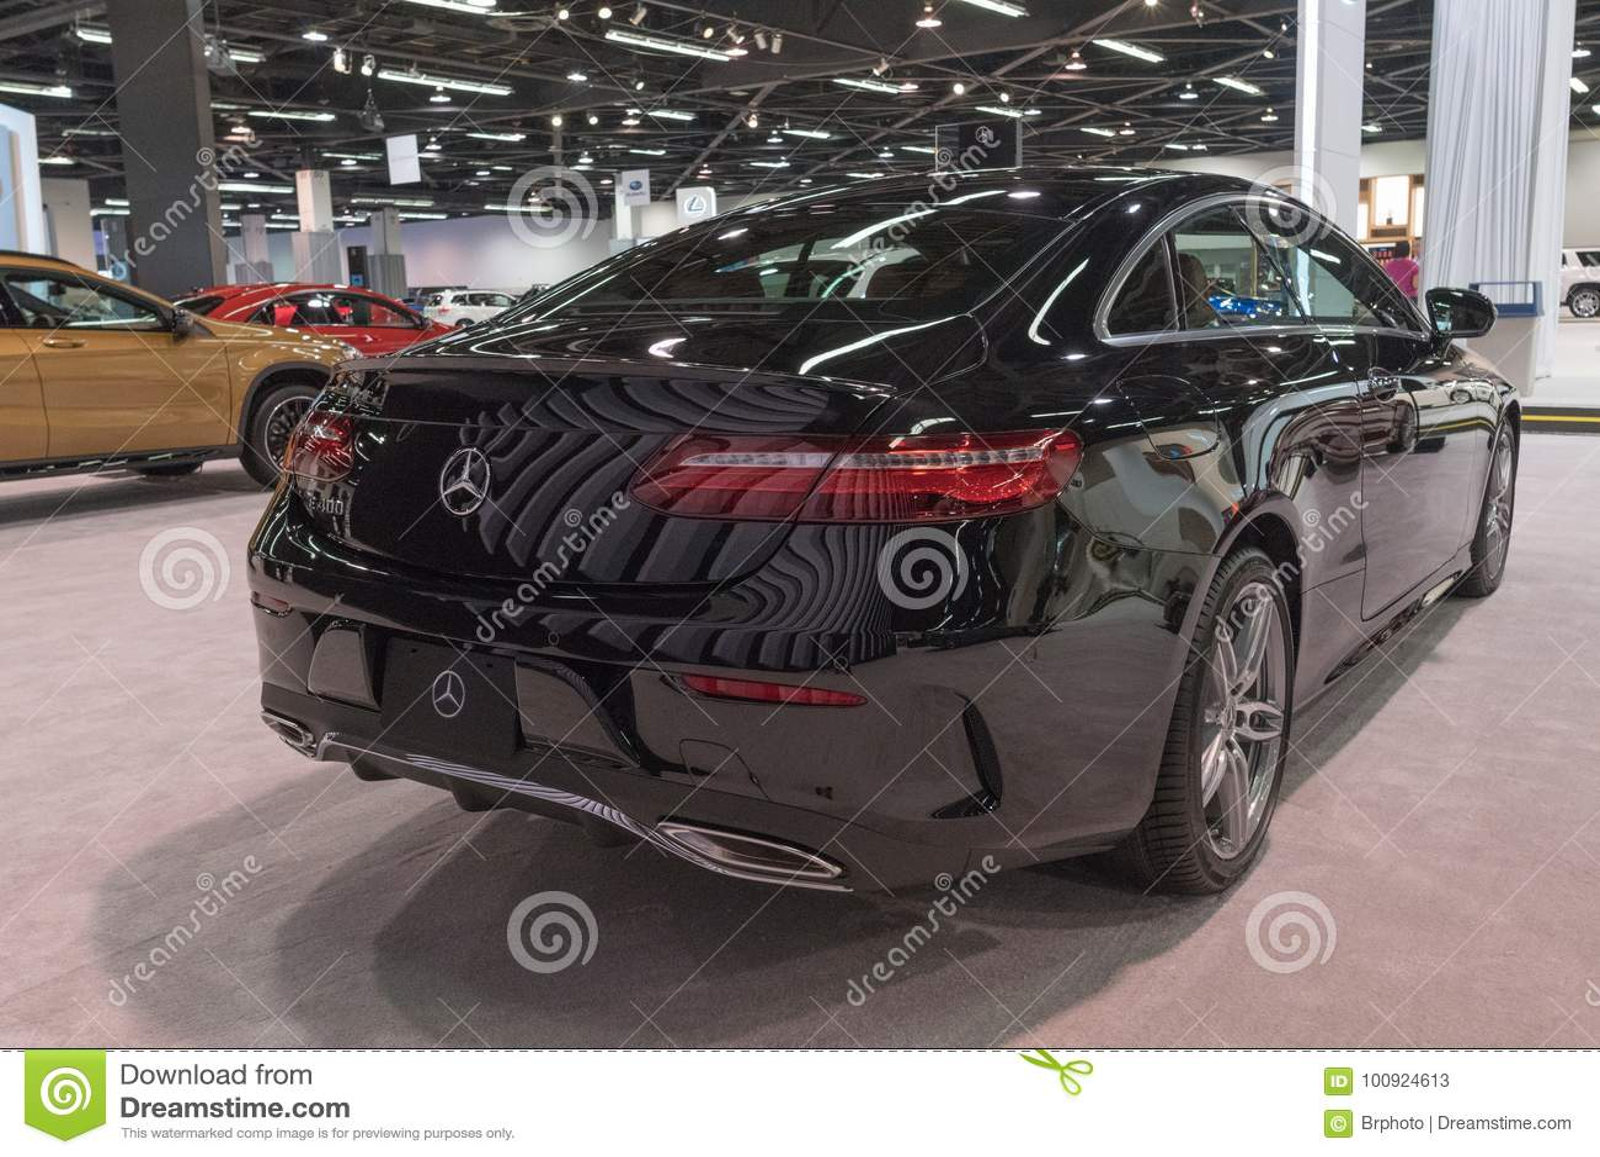 Mercedes Benz E400 On Display